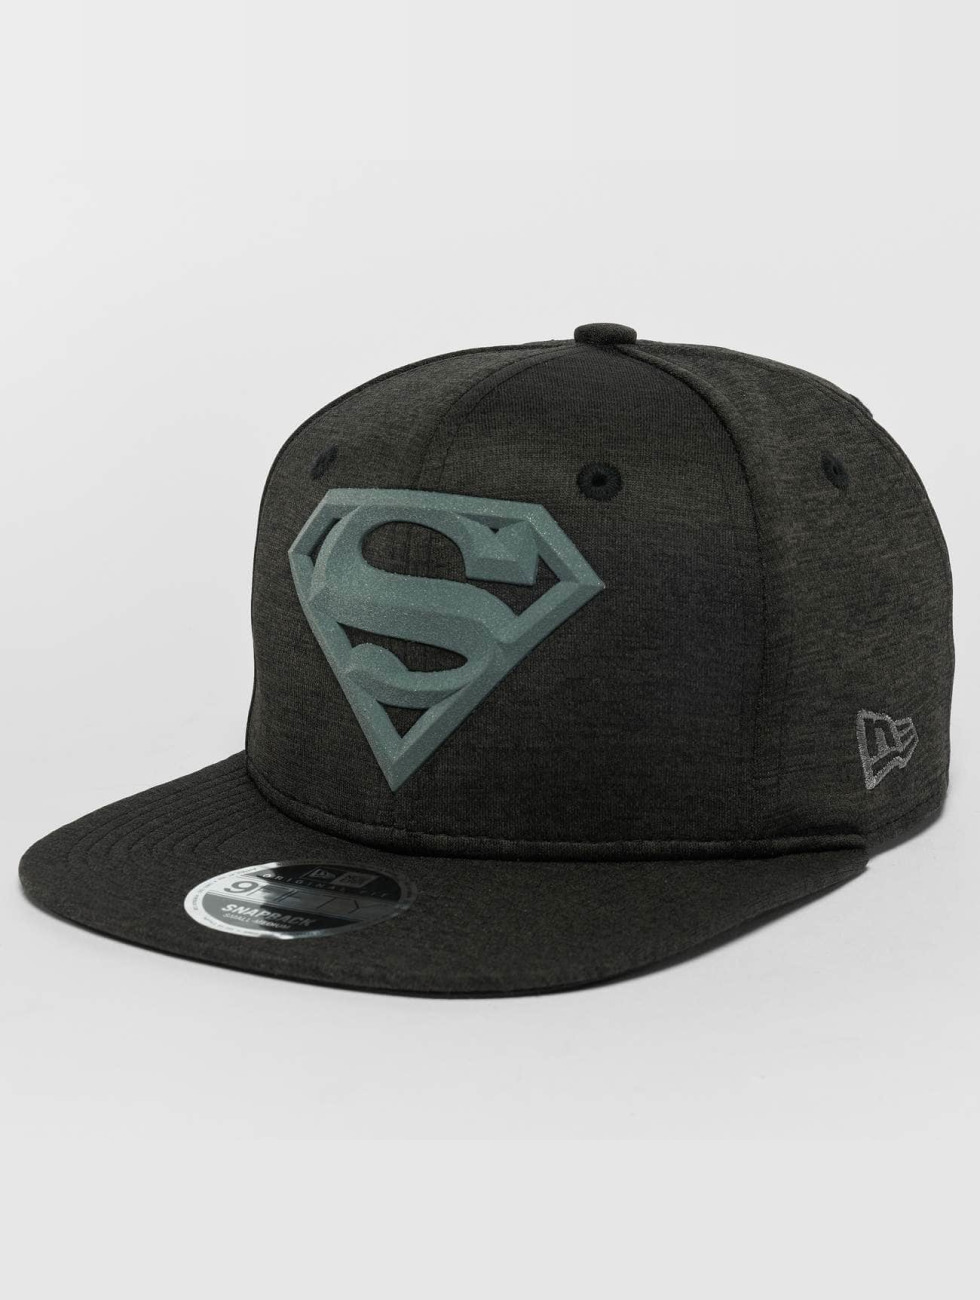 New Era Gorra Snapback Concrete Jersey Superman 9Fifty negro